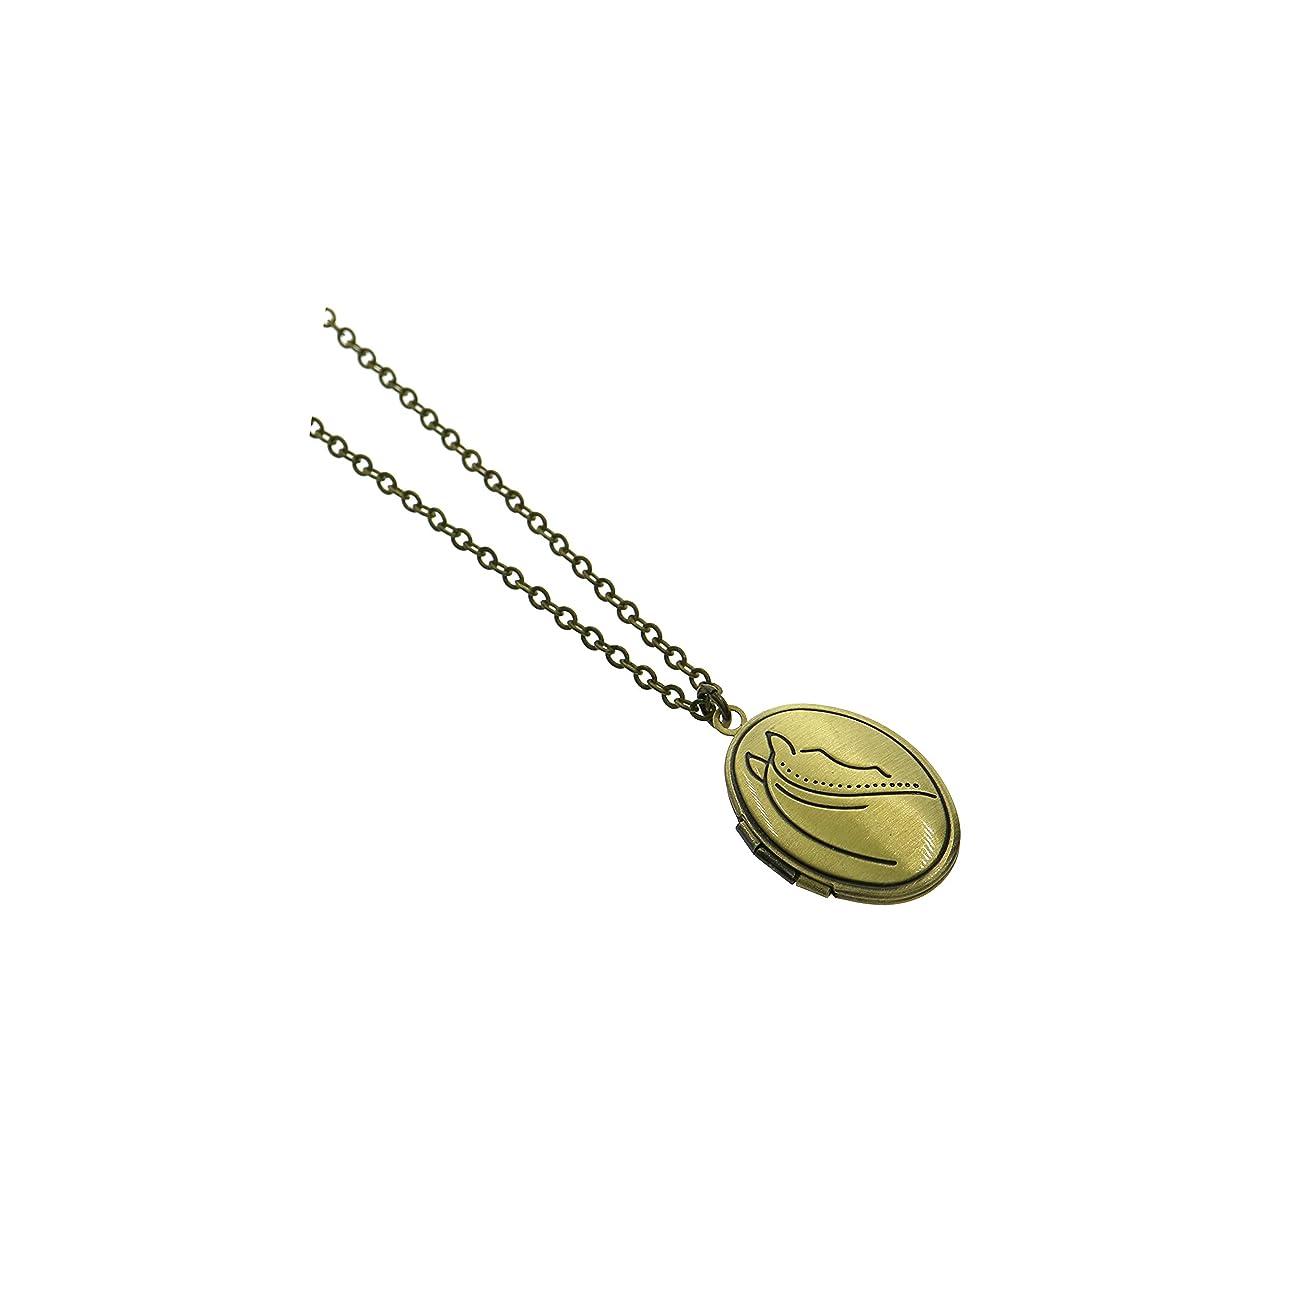 Ms.Iconic Vintage Style Horse Oval Photo Locket Charm Necklace 18+2''